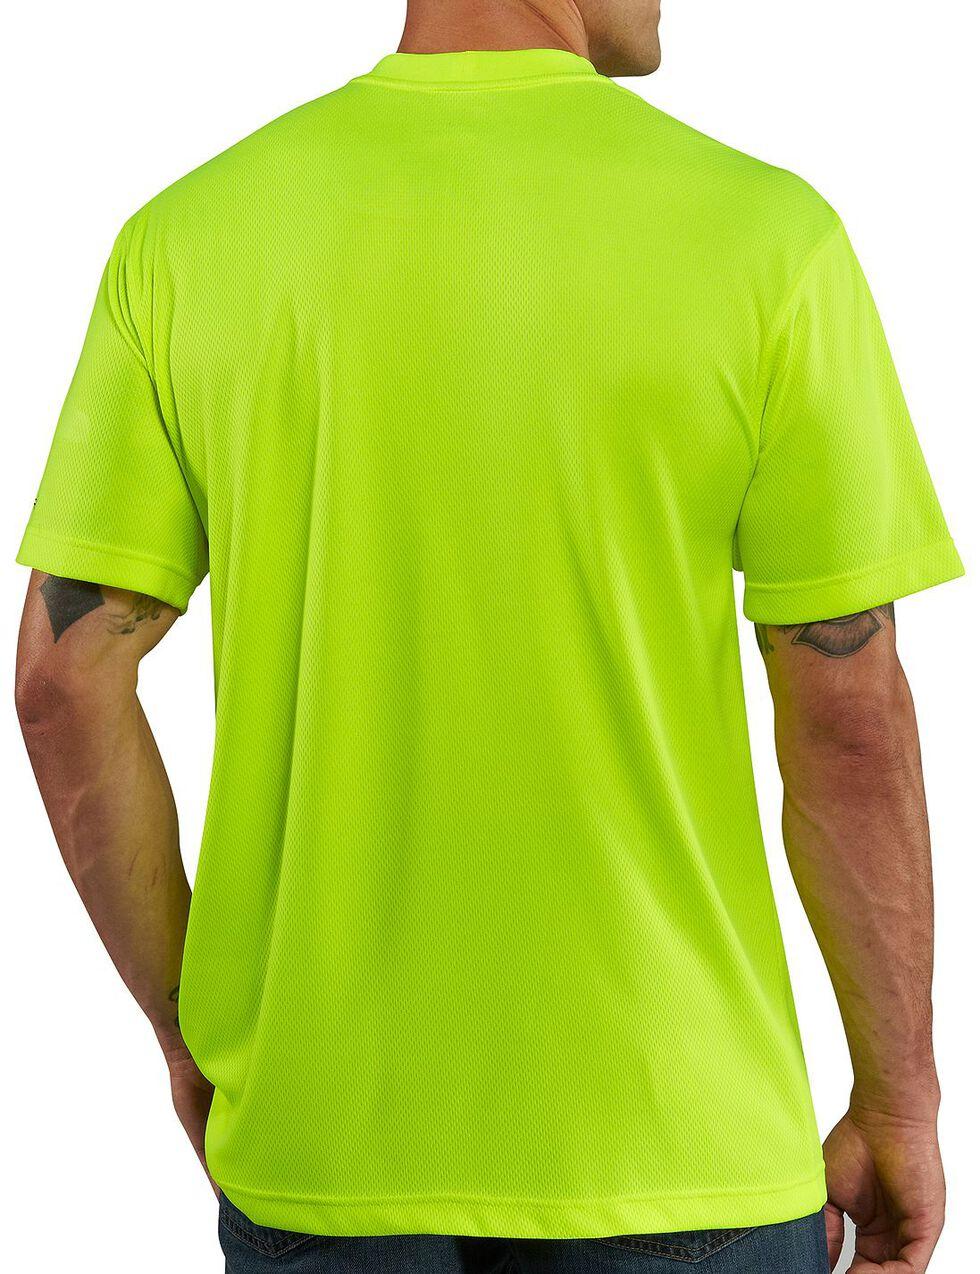 Carhartt Force Color-Enhanced T-Shirt, Lime, hi-res